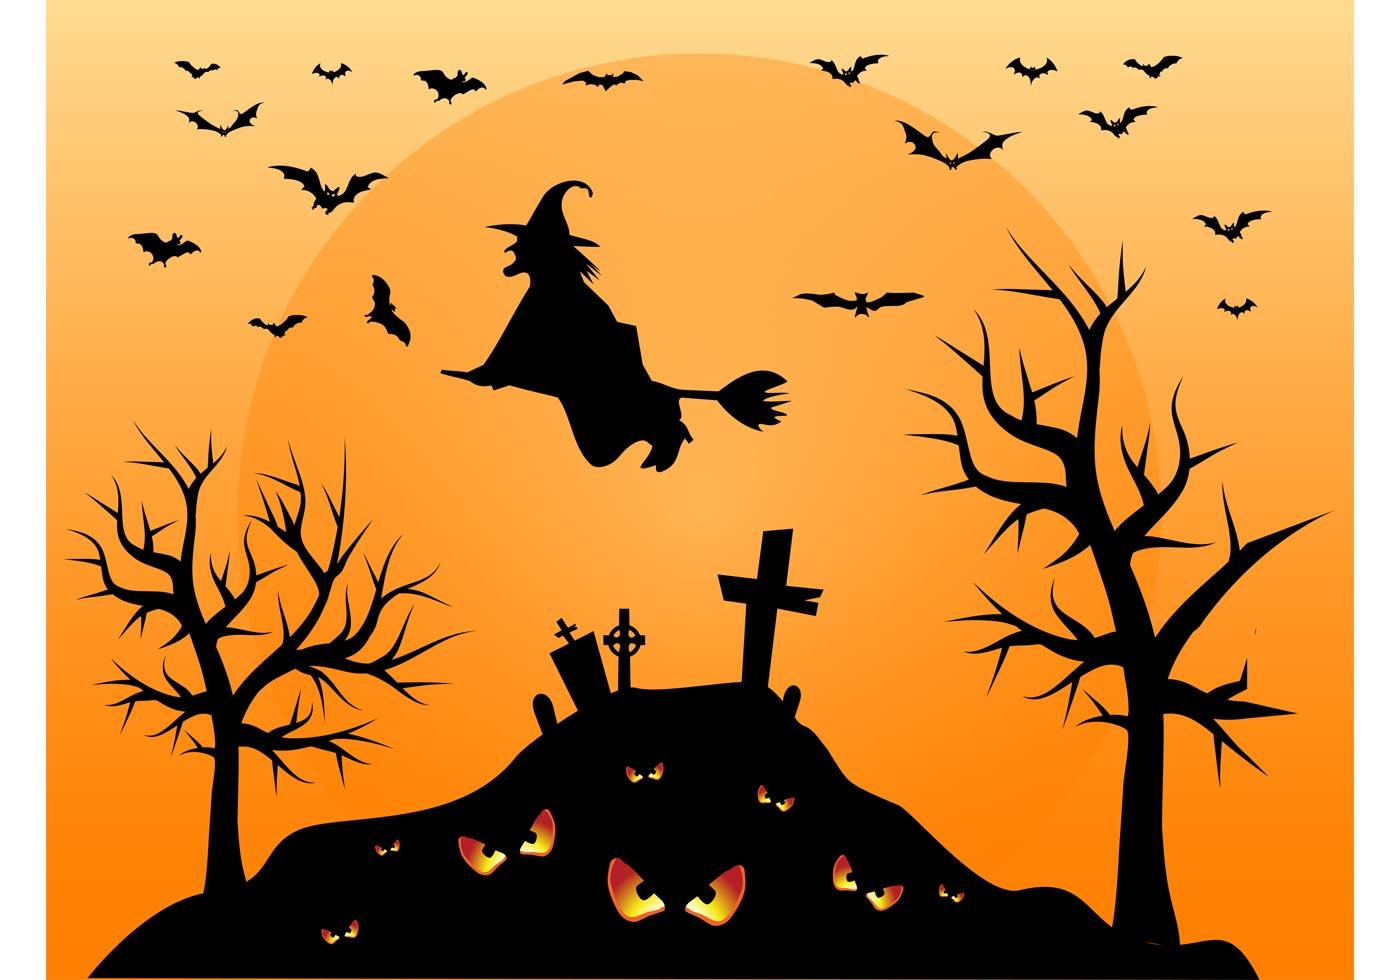 halloween cemetery - download free vector art, stock graphics & images